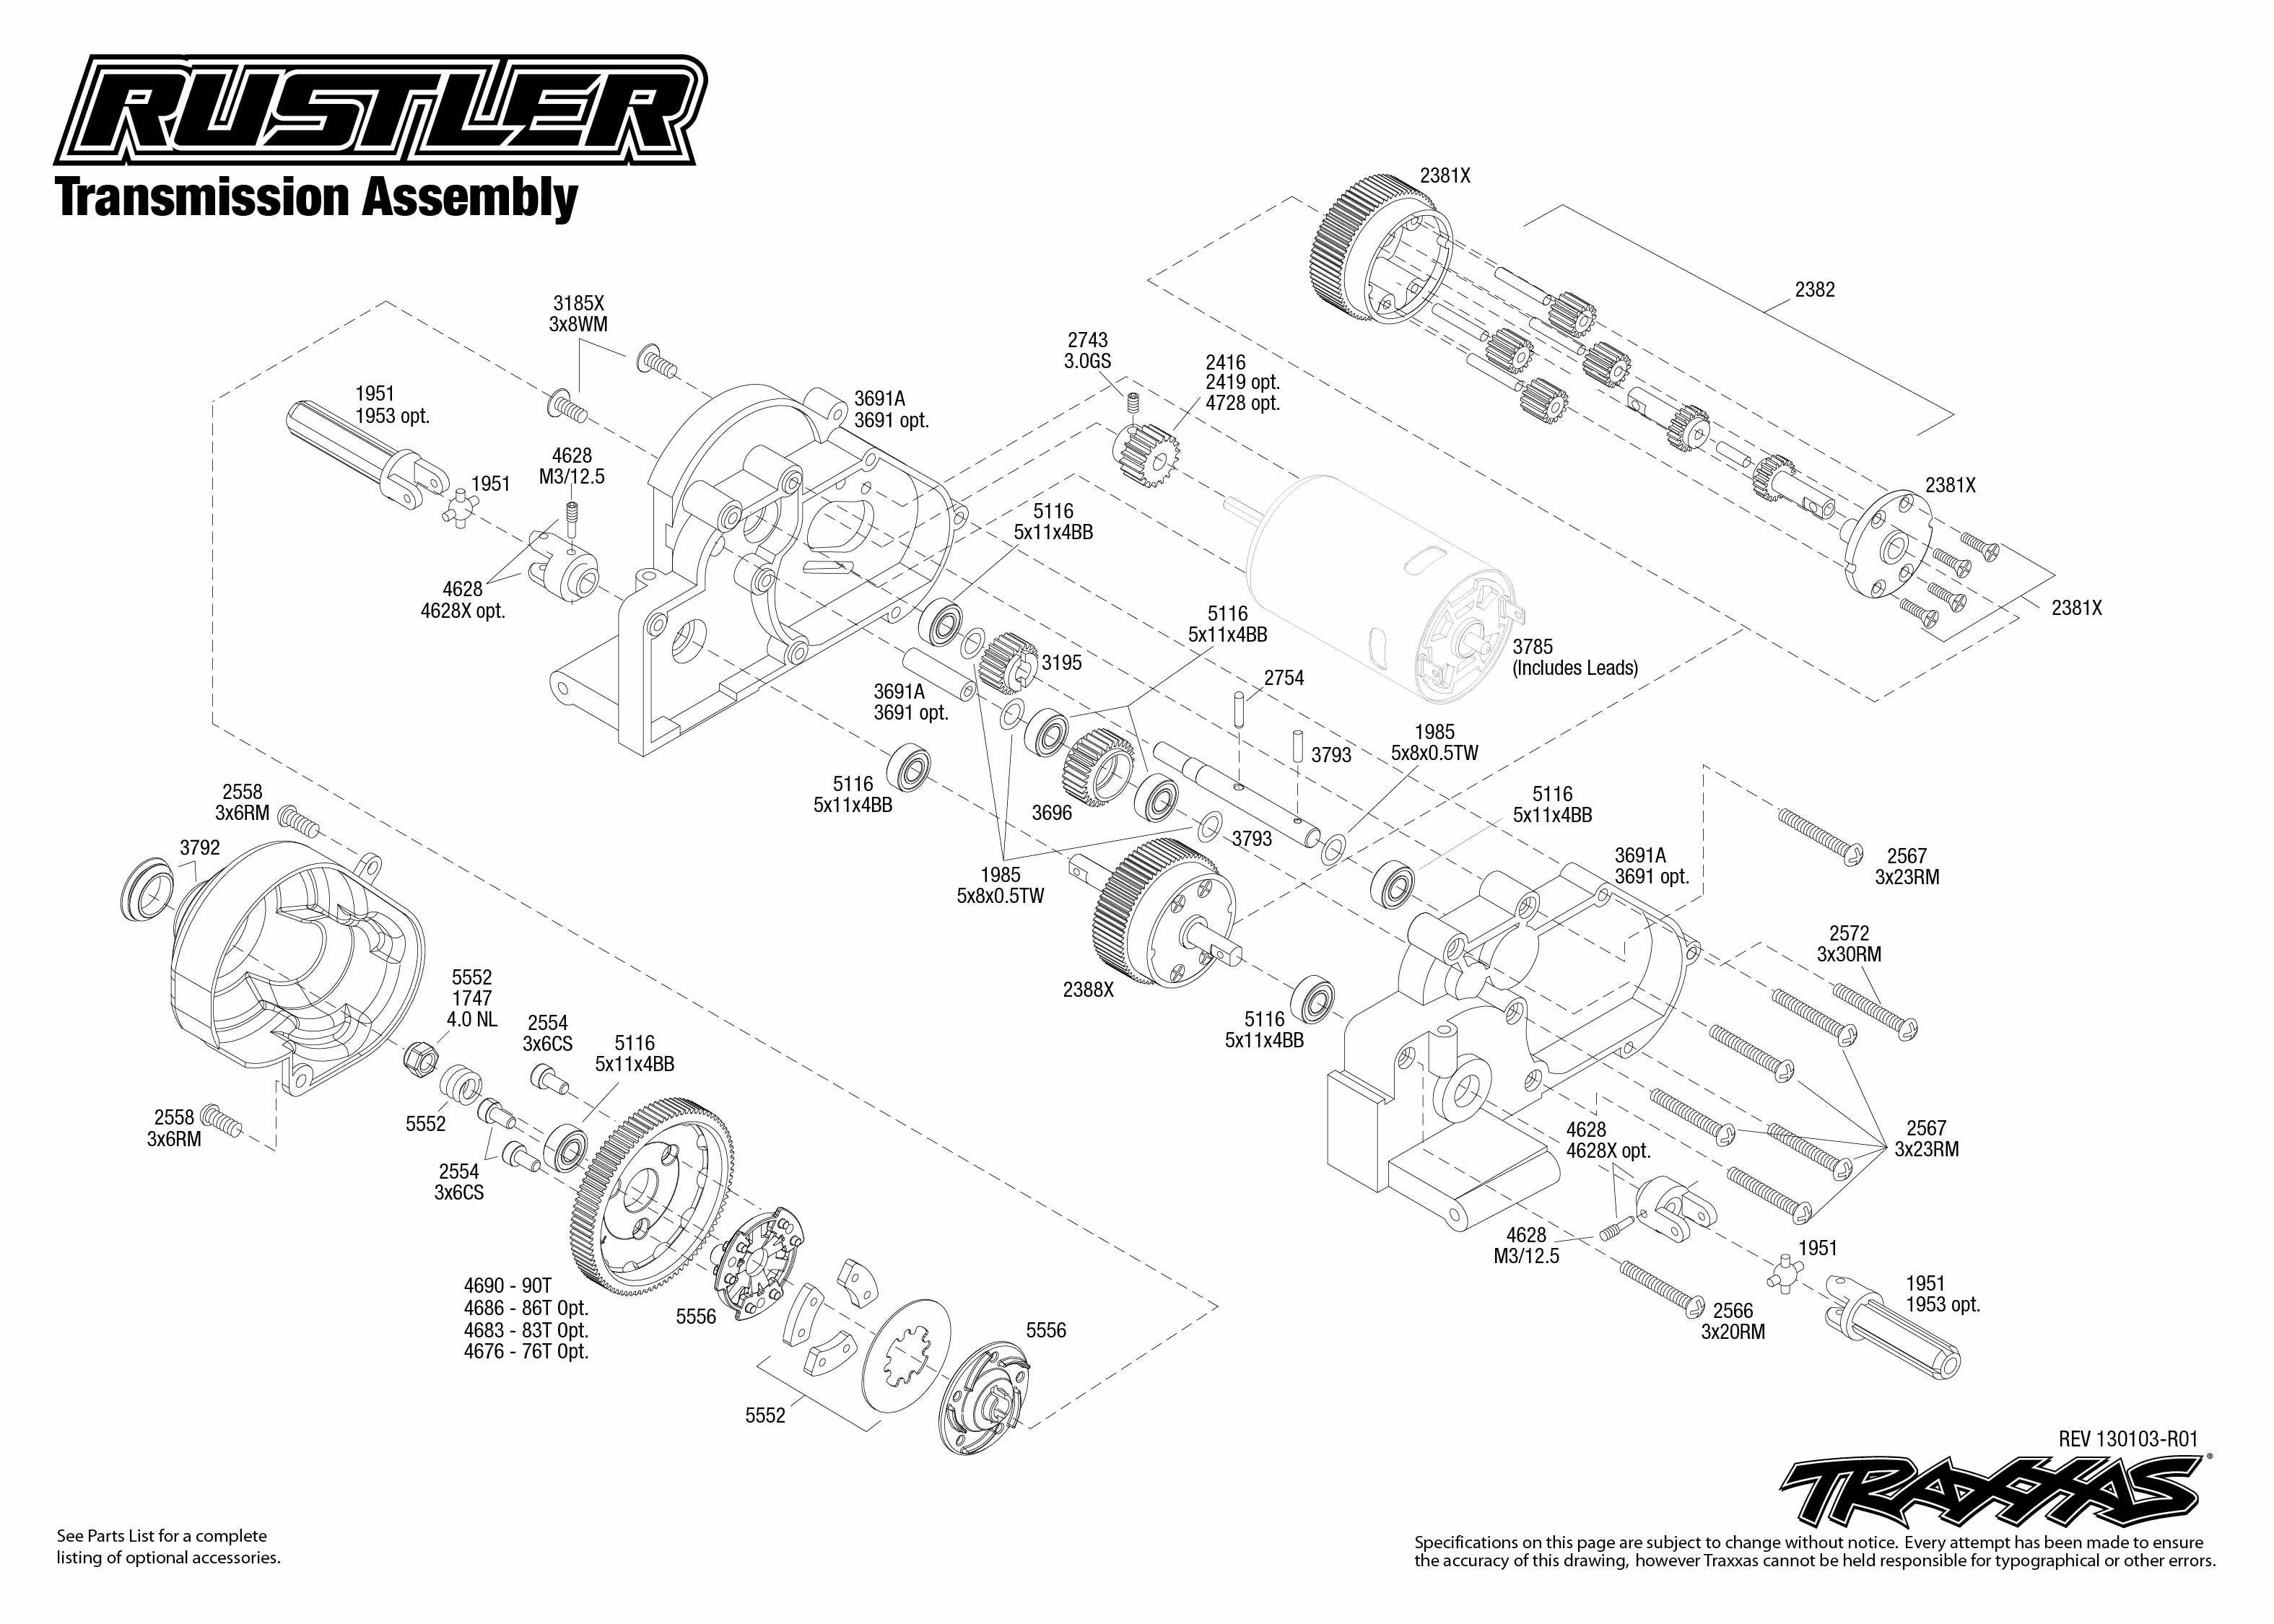 traxxas t maxx 2 5 transmission diagram jeep jk headlight wiring 1 10 scale rustler xl 2wd stadium truck 37054